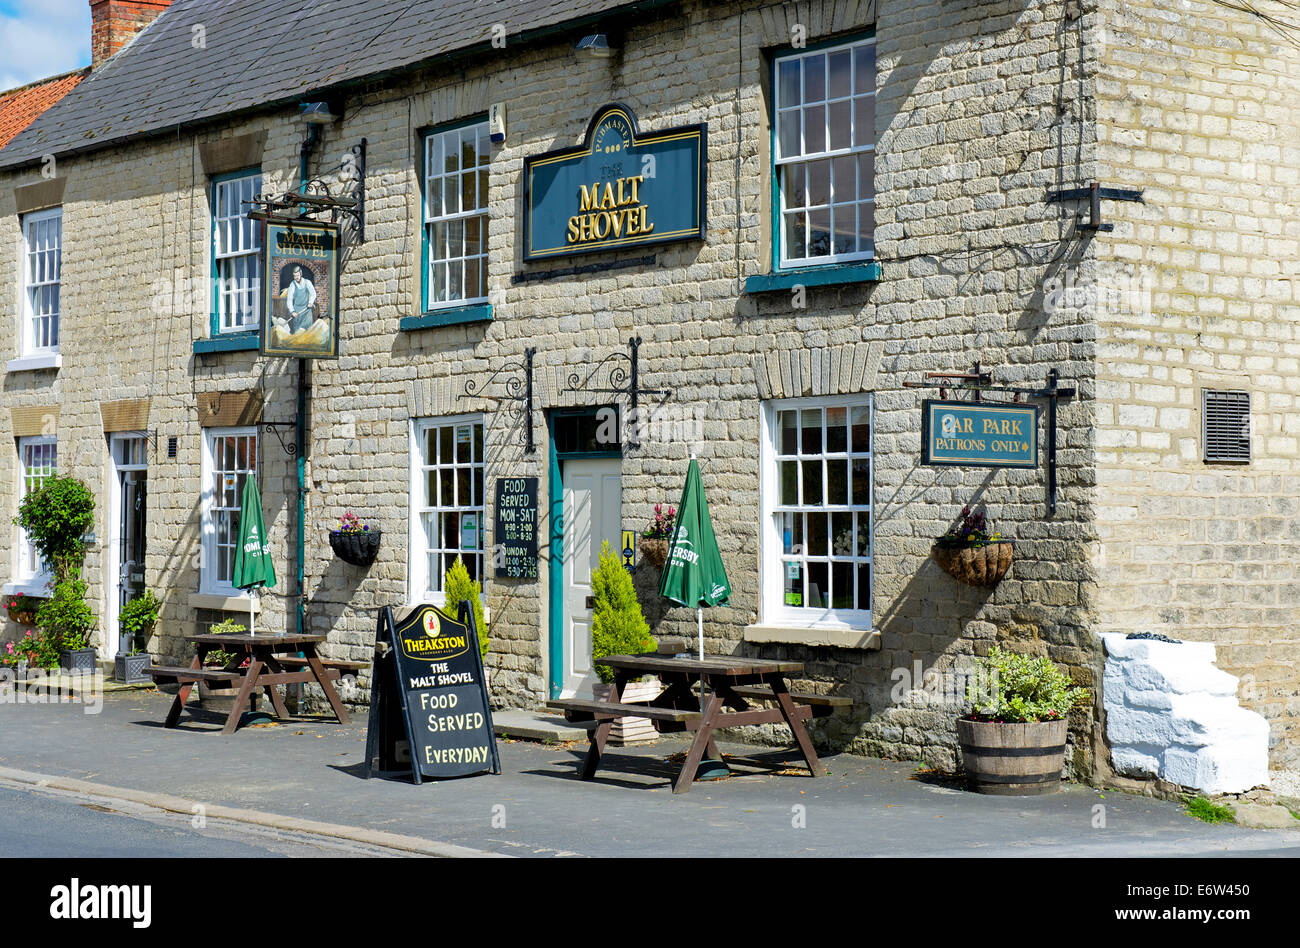 The Malt Shovel pub in the village of Hovingham, North Yorkshire, England UK - Stock Image